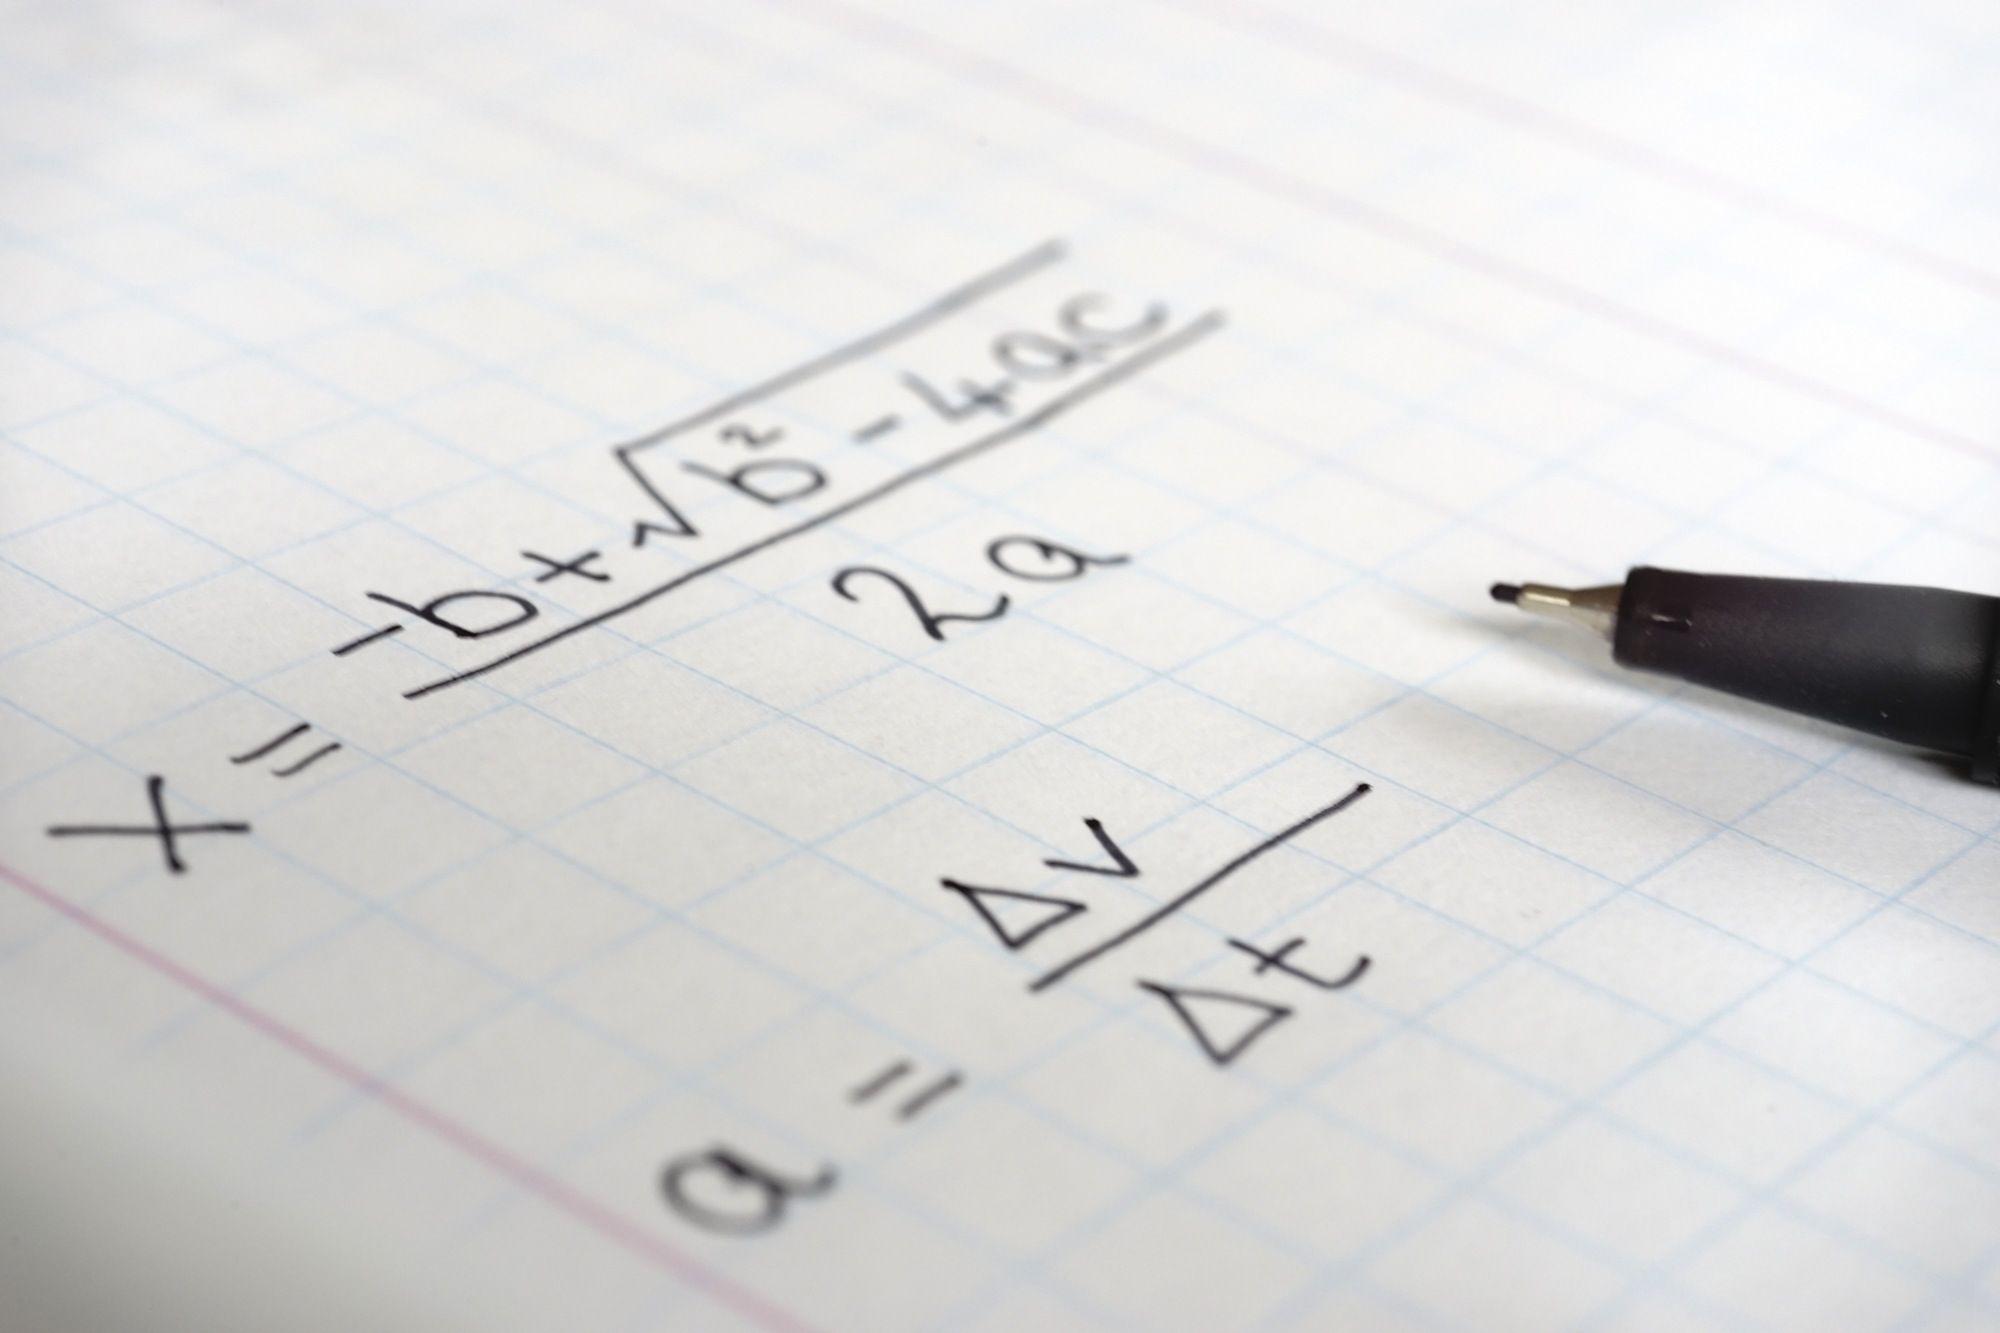 Using The Quadratic Formula With No X Intercept